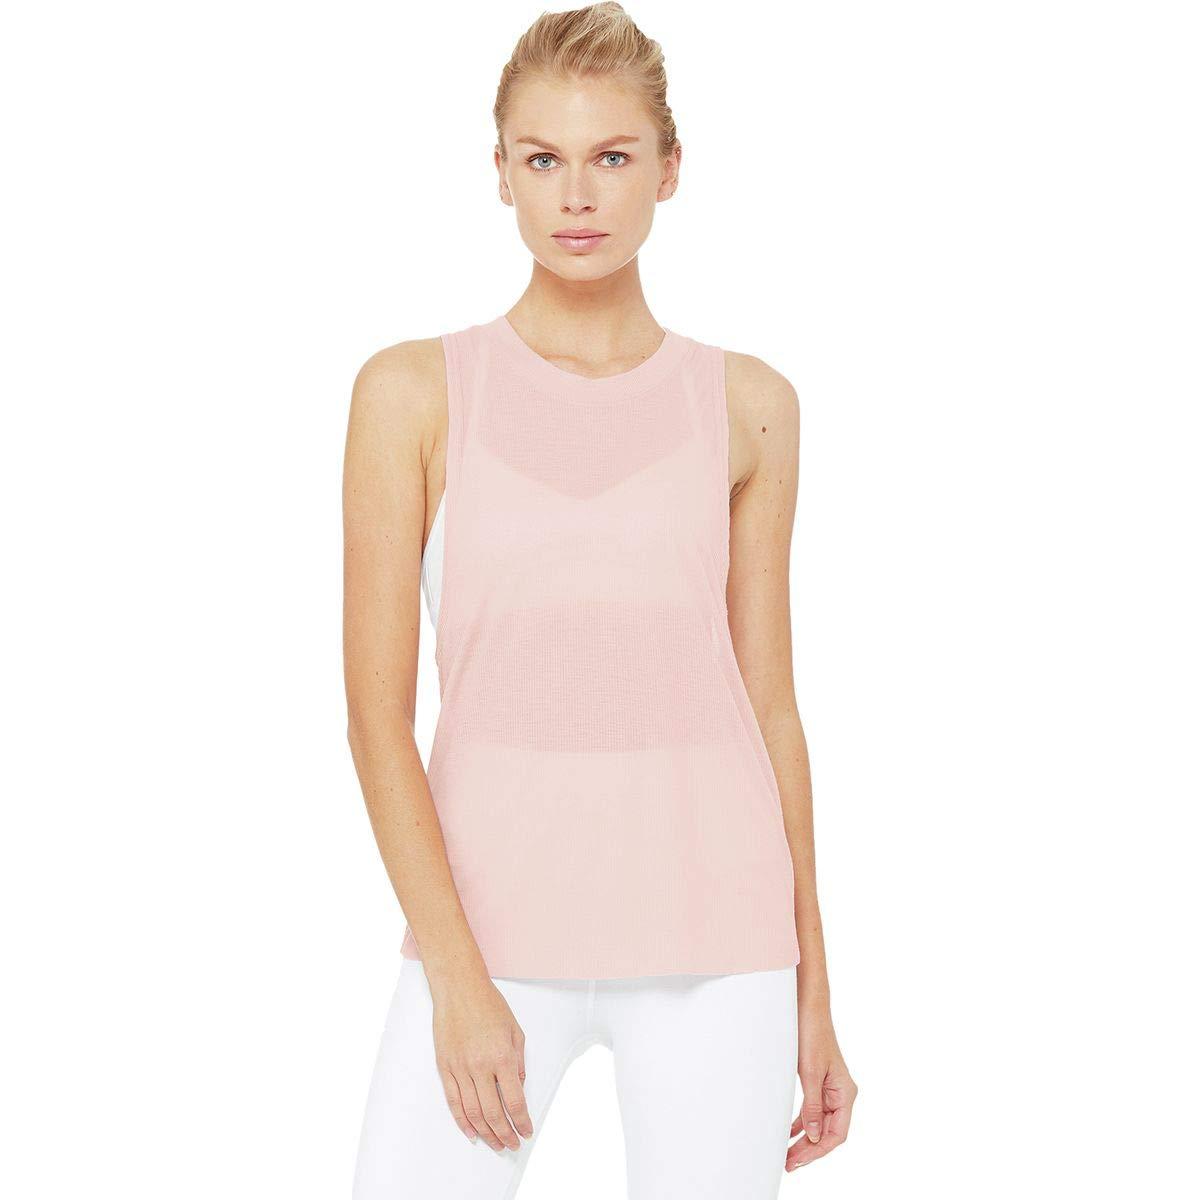 Alo Yoga - Camiseta sin Mangas para Mujer, Medium, Malva ...